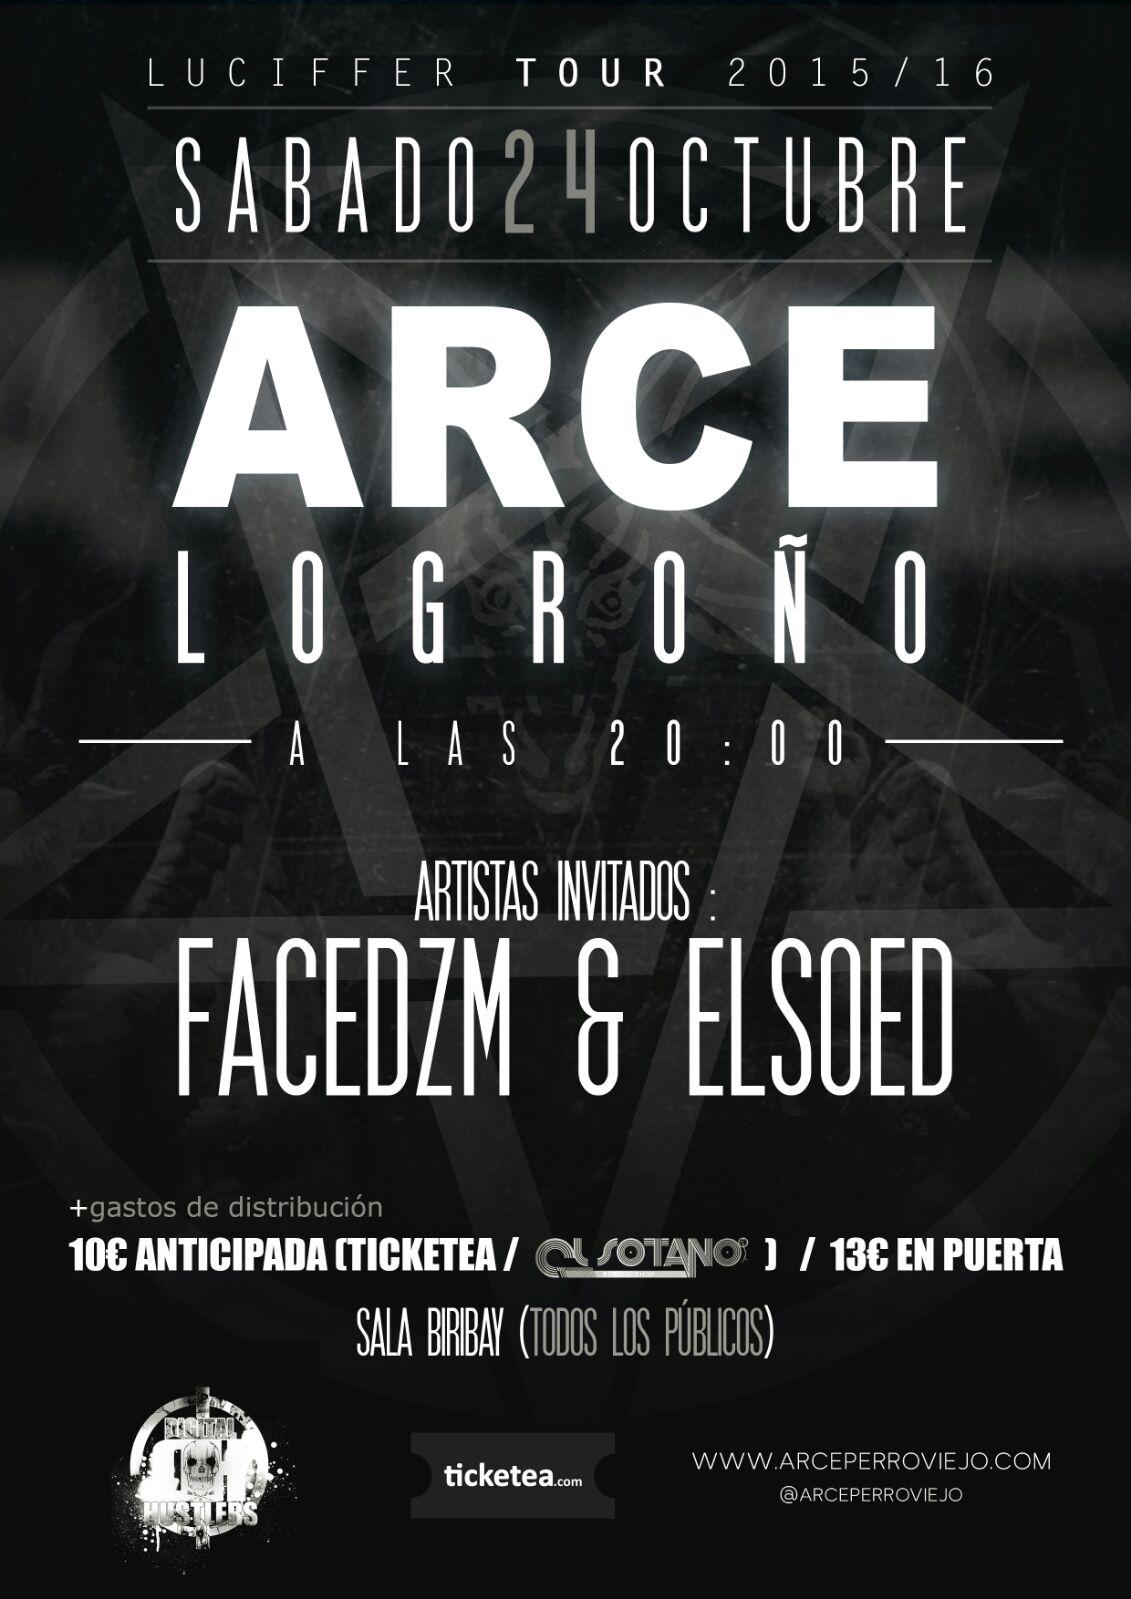 Arce empieza su gira en Logroño